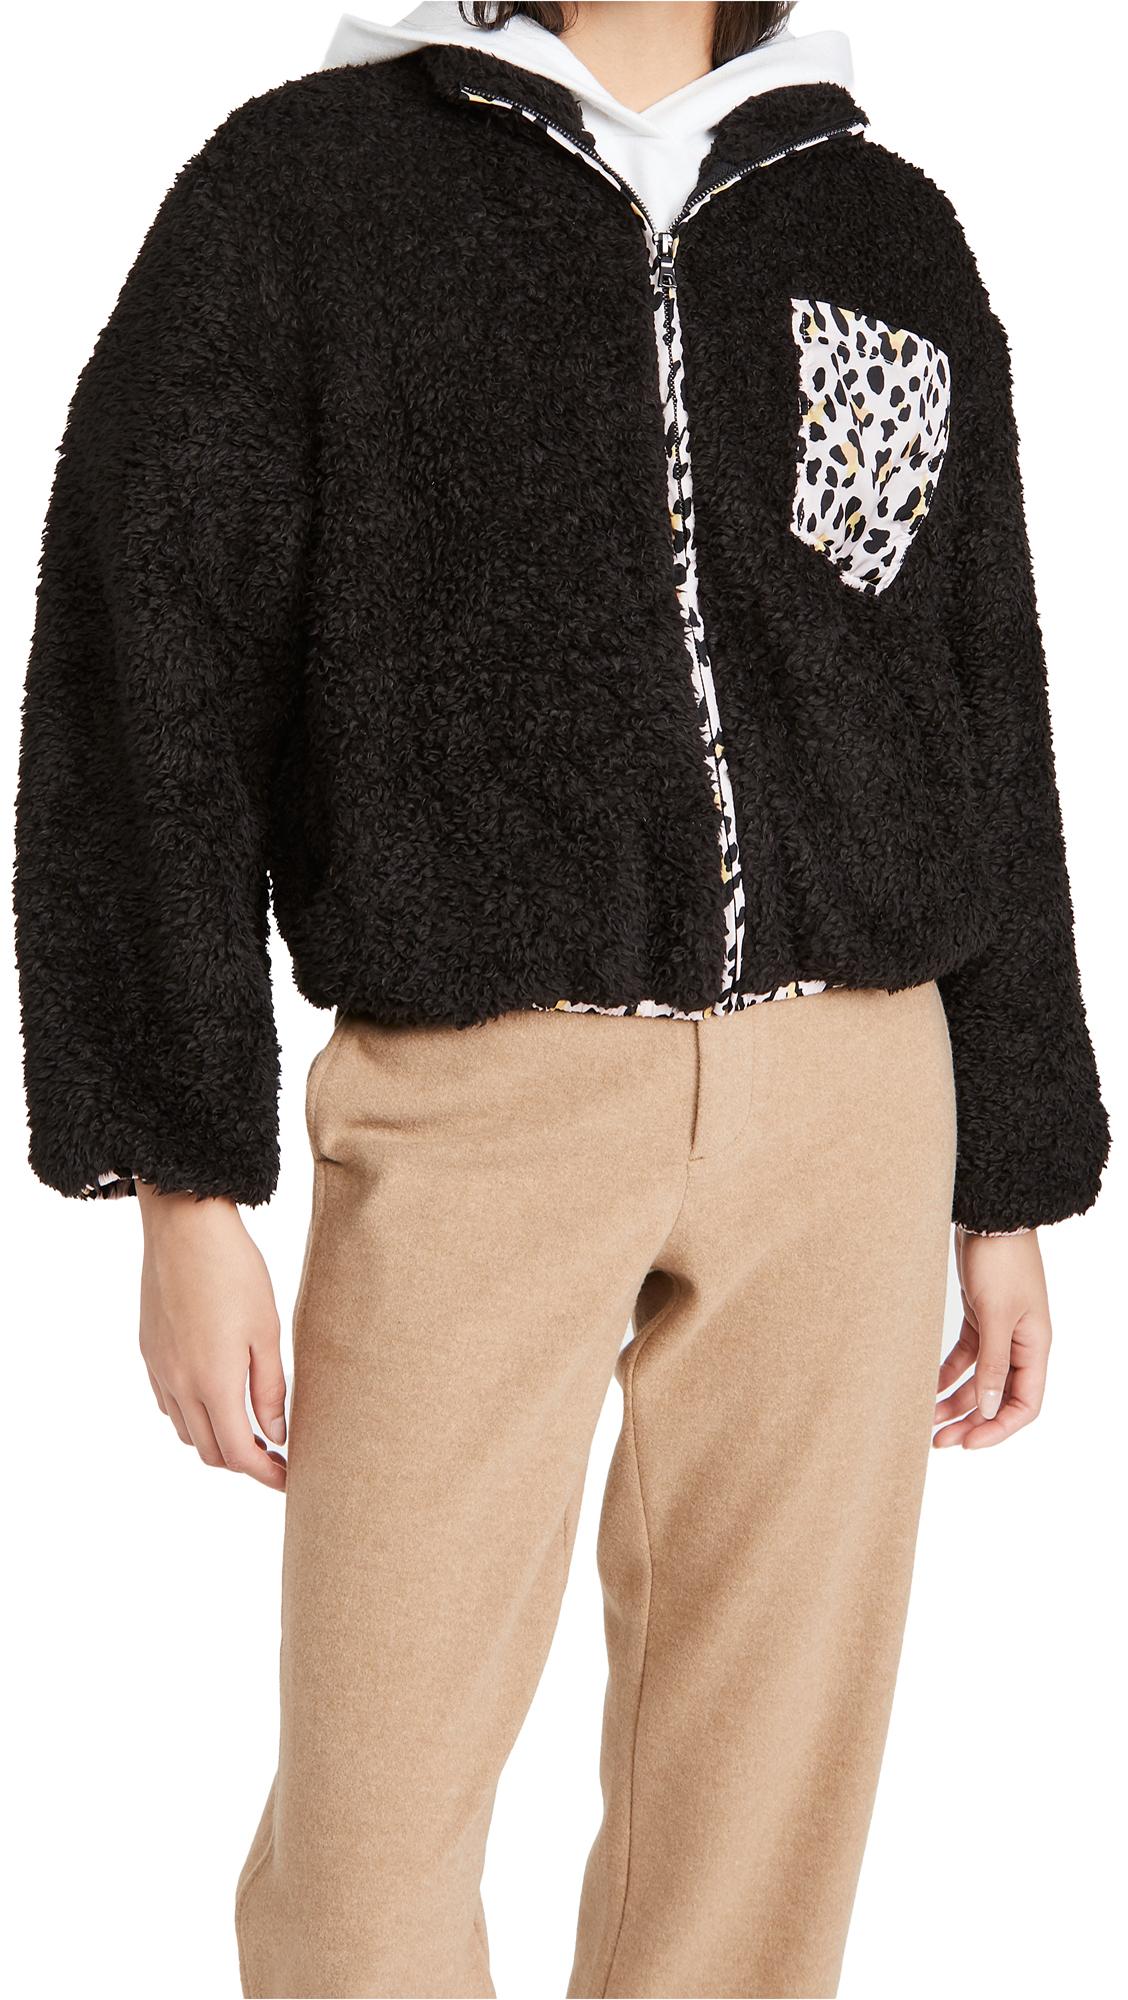 Plush Cheetah Fleece Jacket